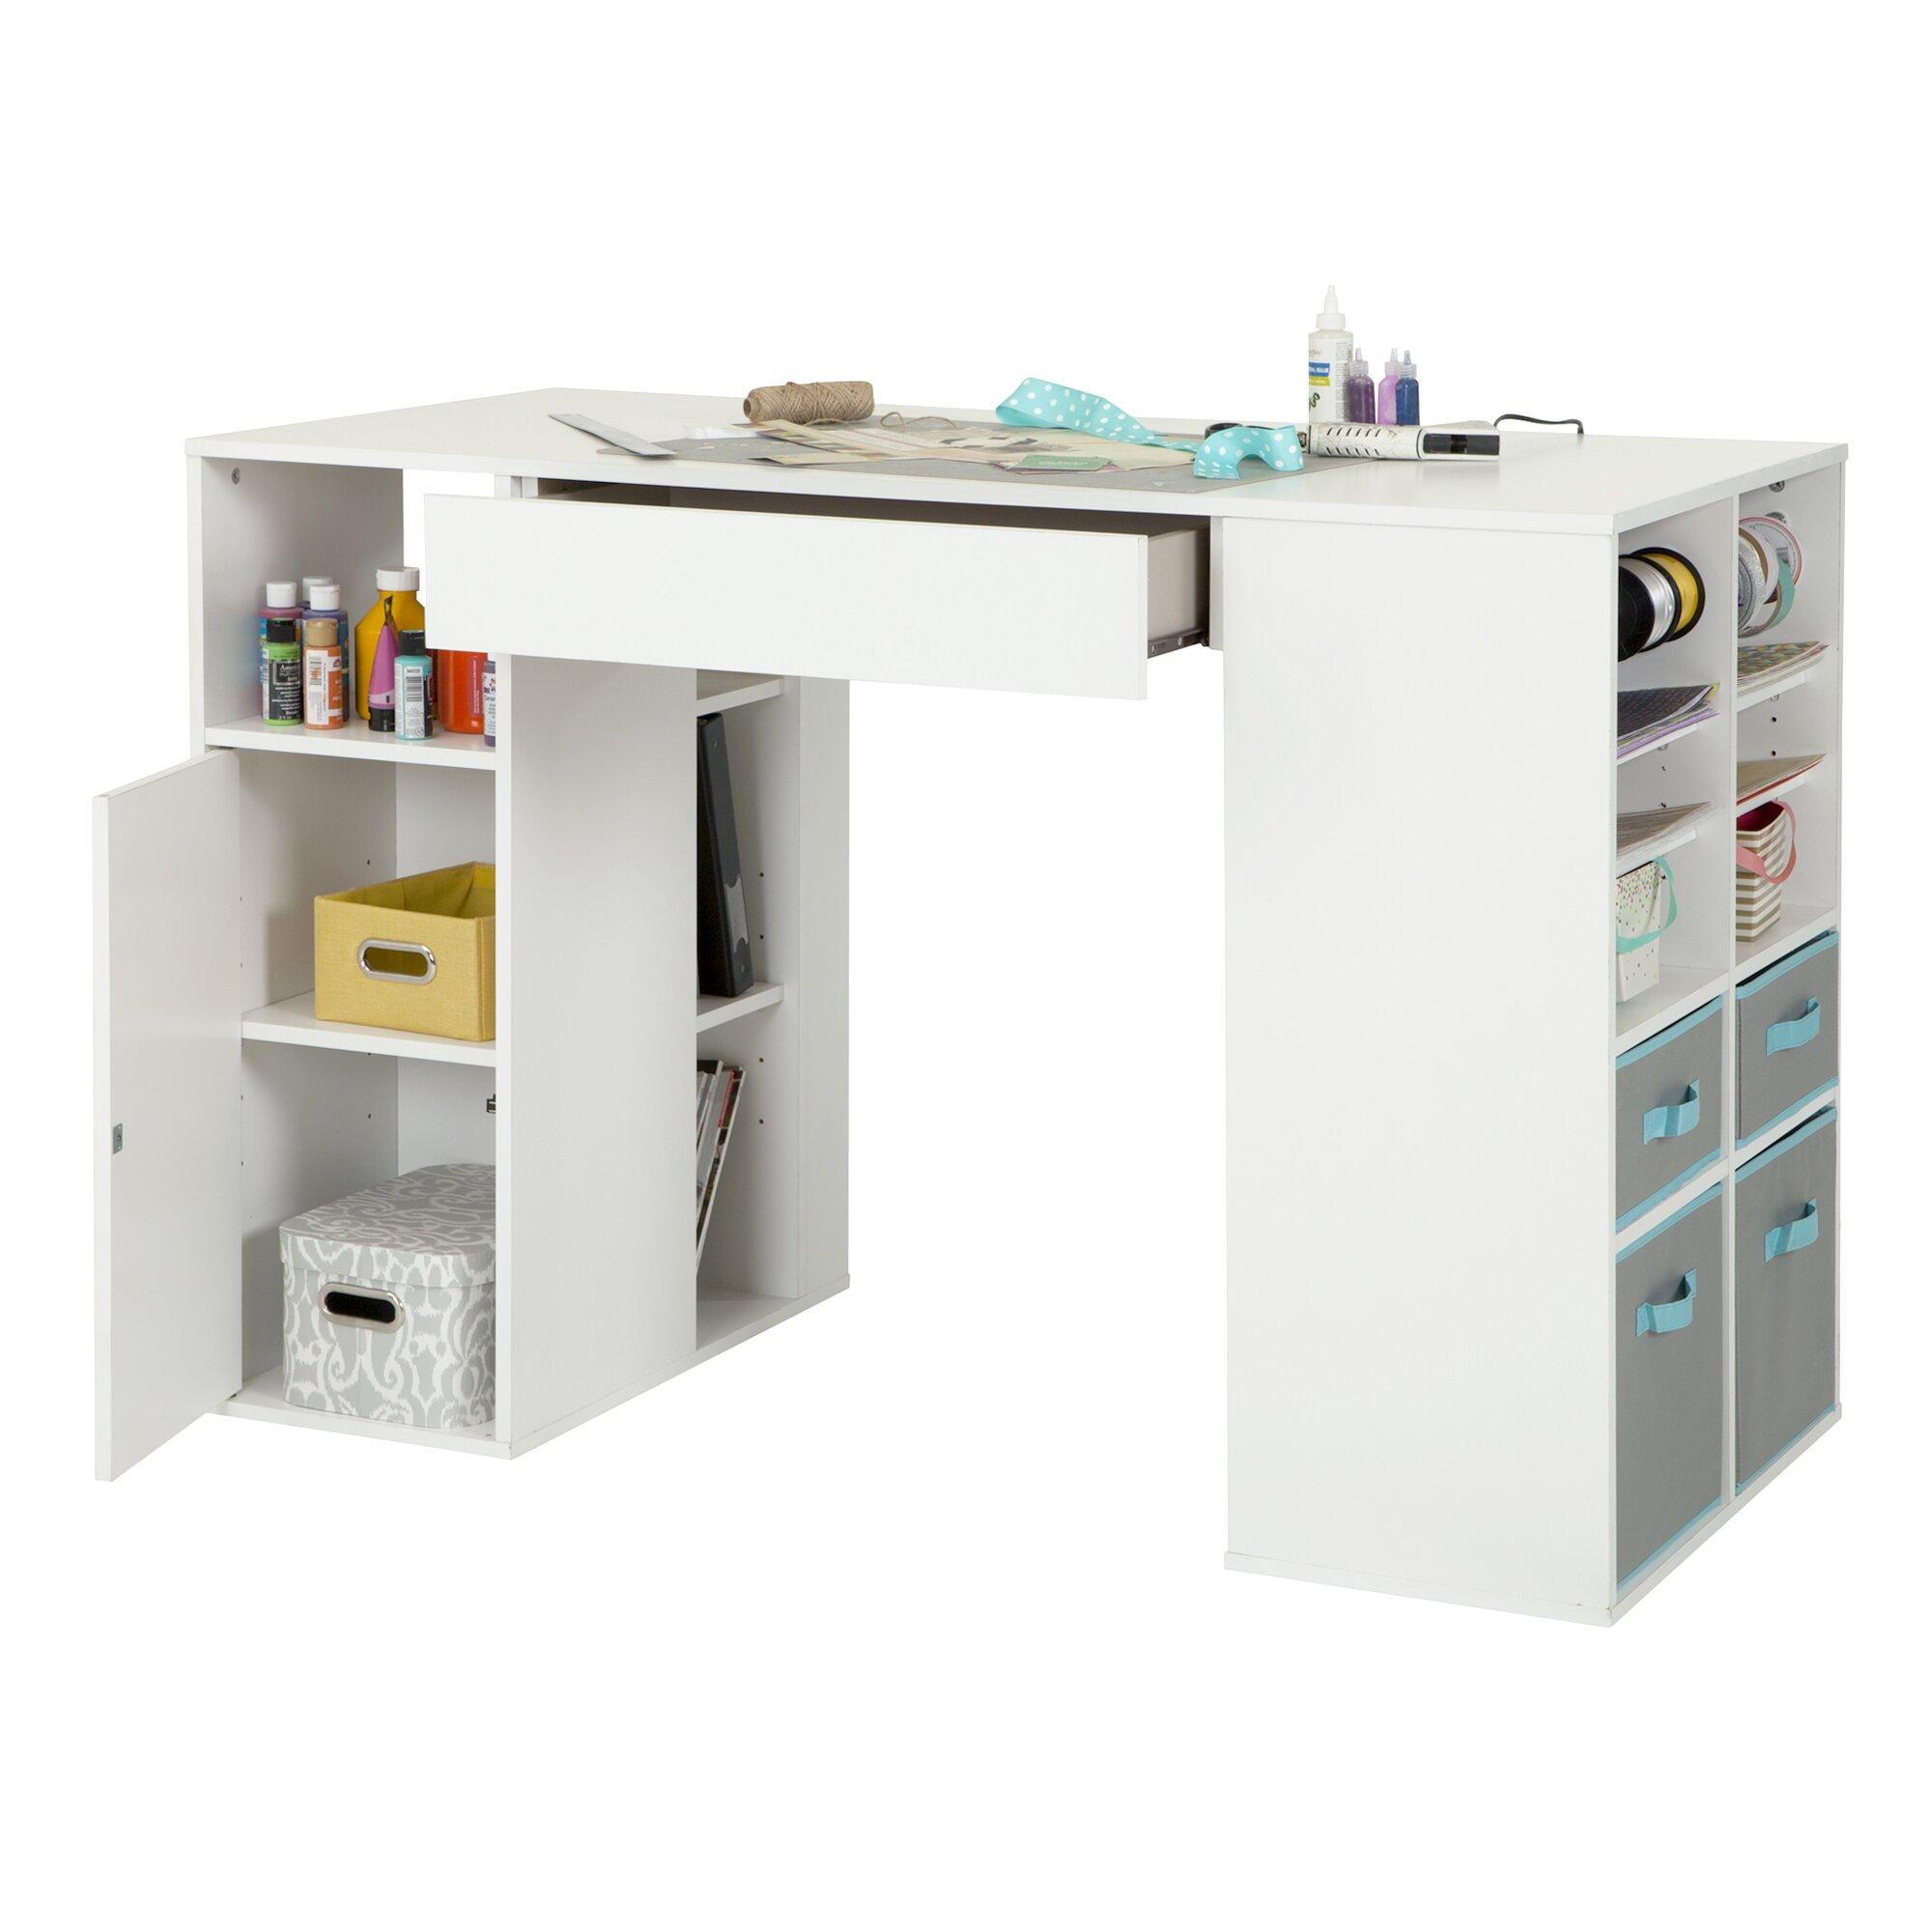 South shore crea counter height craft table reviews for South shore sewing craft table